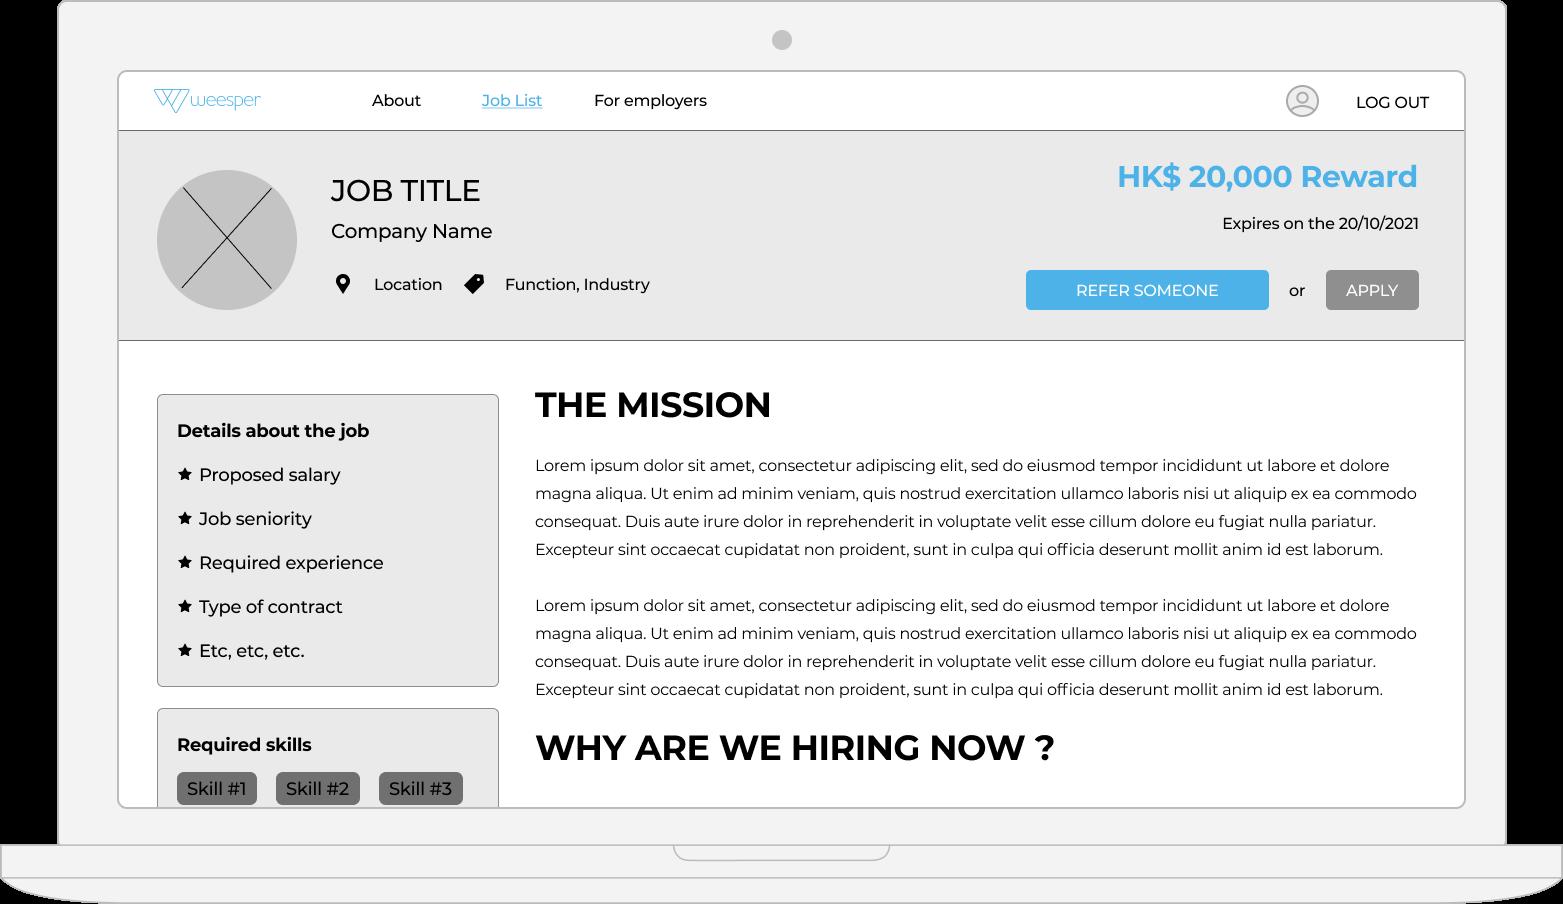 weesper job page desktop web design